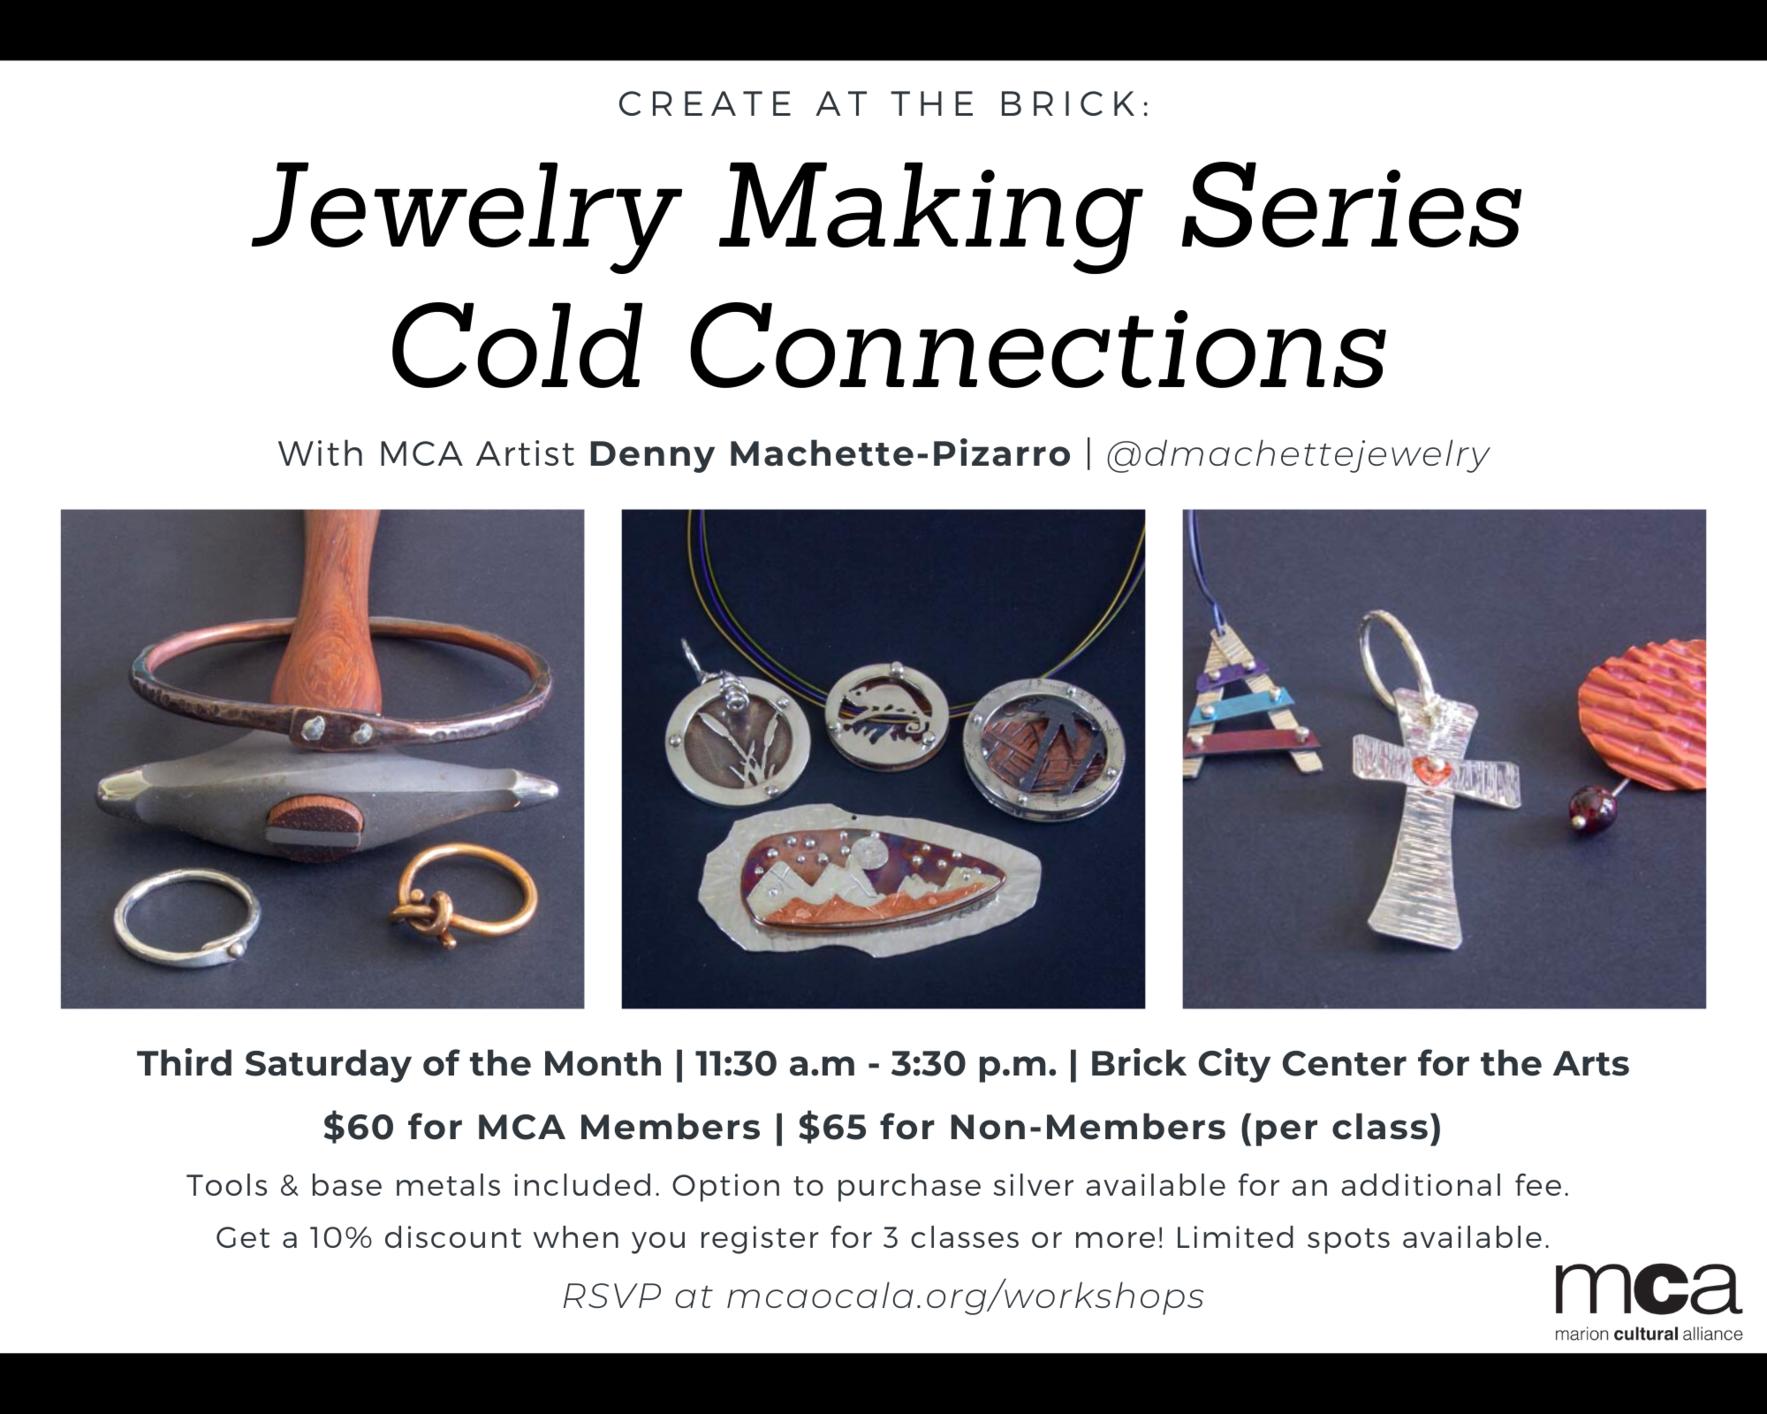 CREATE at The Brick: Jewelry Making image